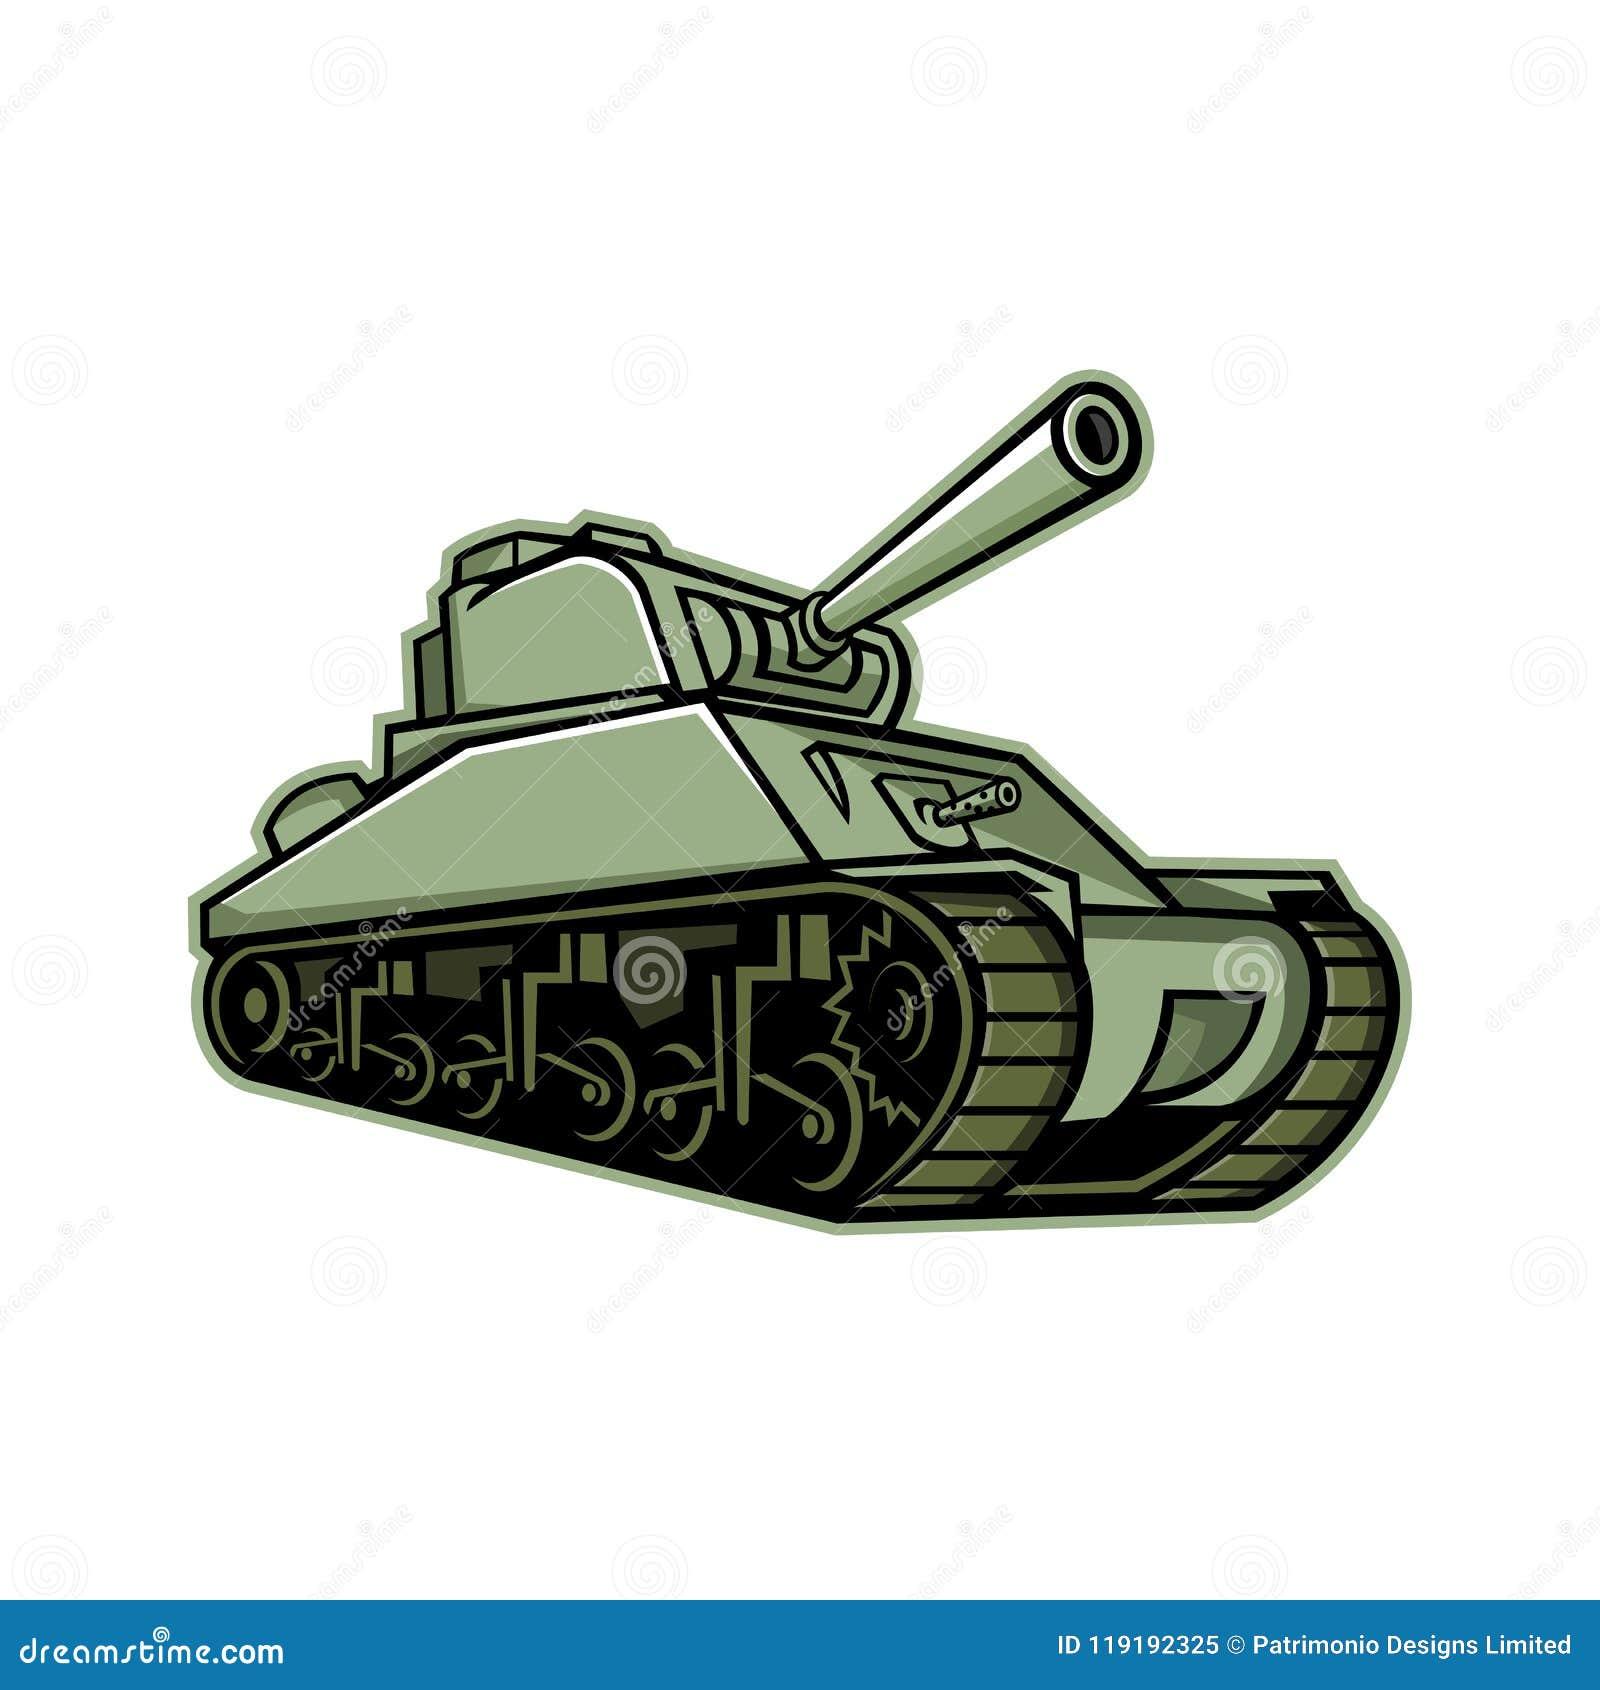 M4 Sherman Medium Tank Mascot Stock Vector - Illustration of